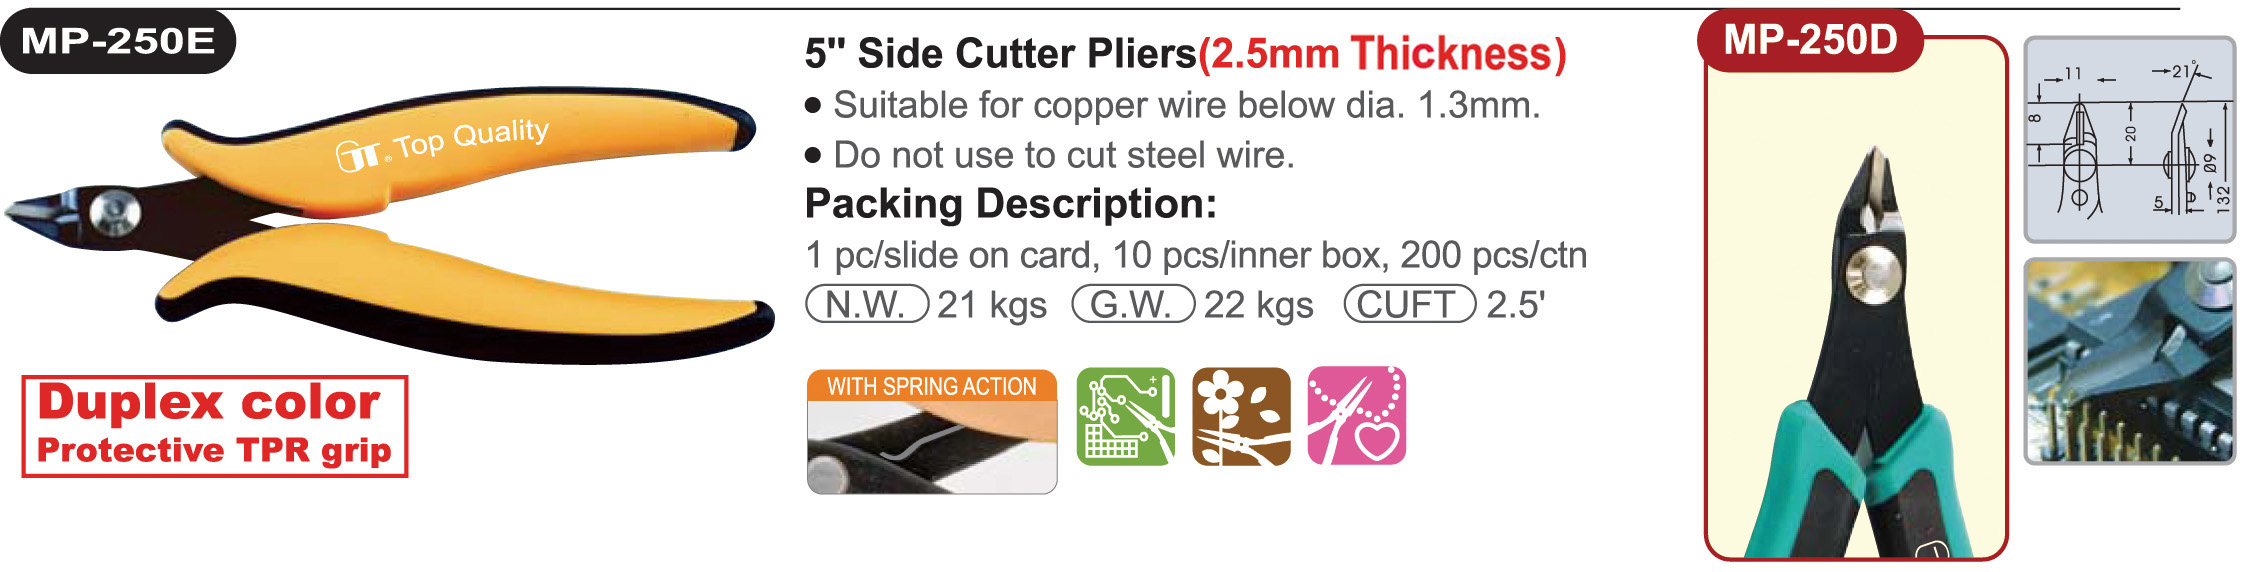 proimages/product/pliers/cutting_pliers/Diagonal_Cutters/MP-250E/MP-250E_00.jpg